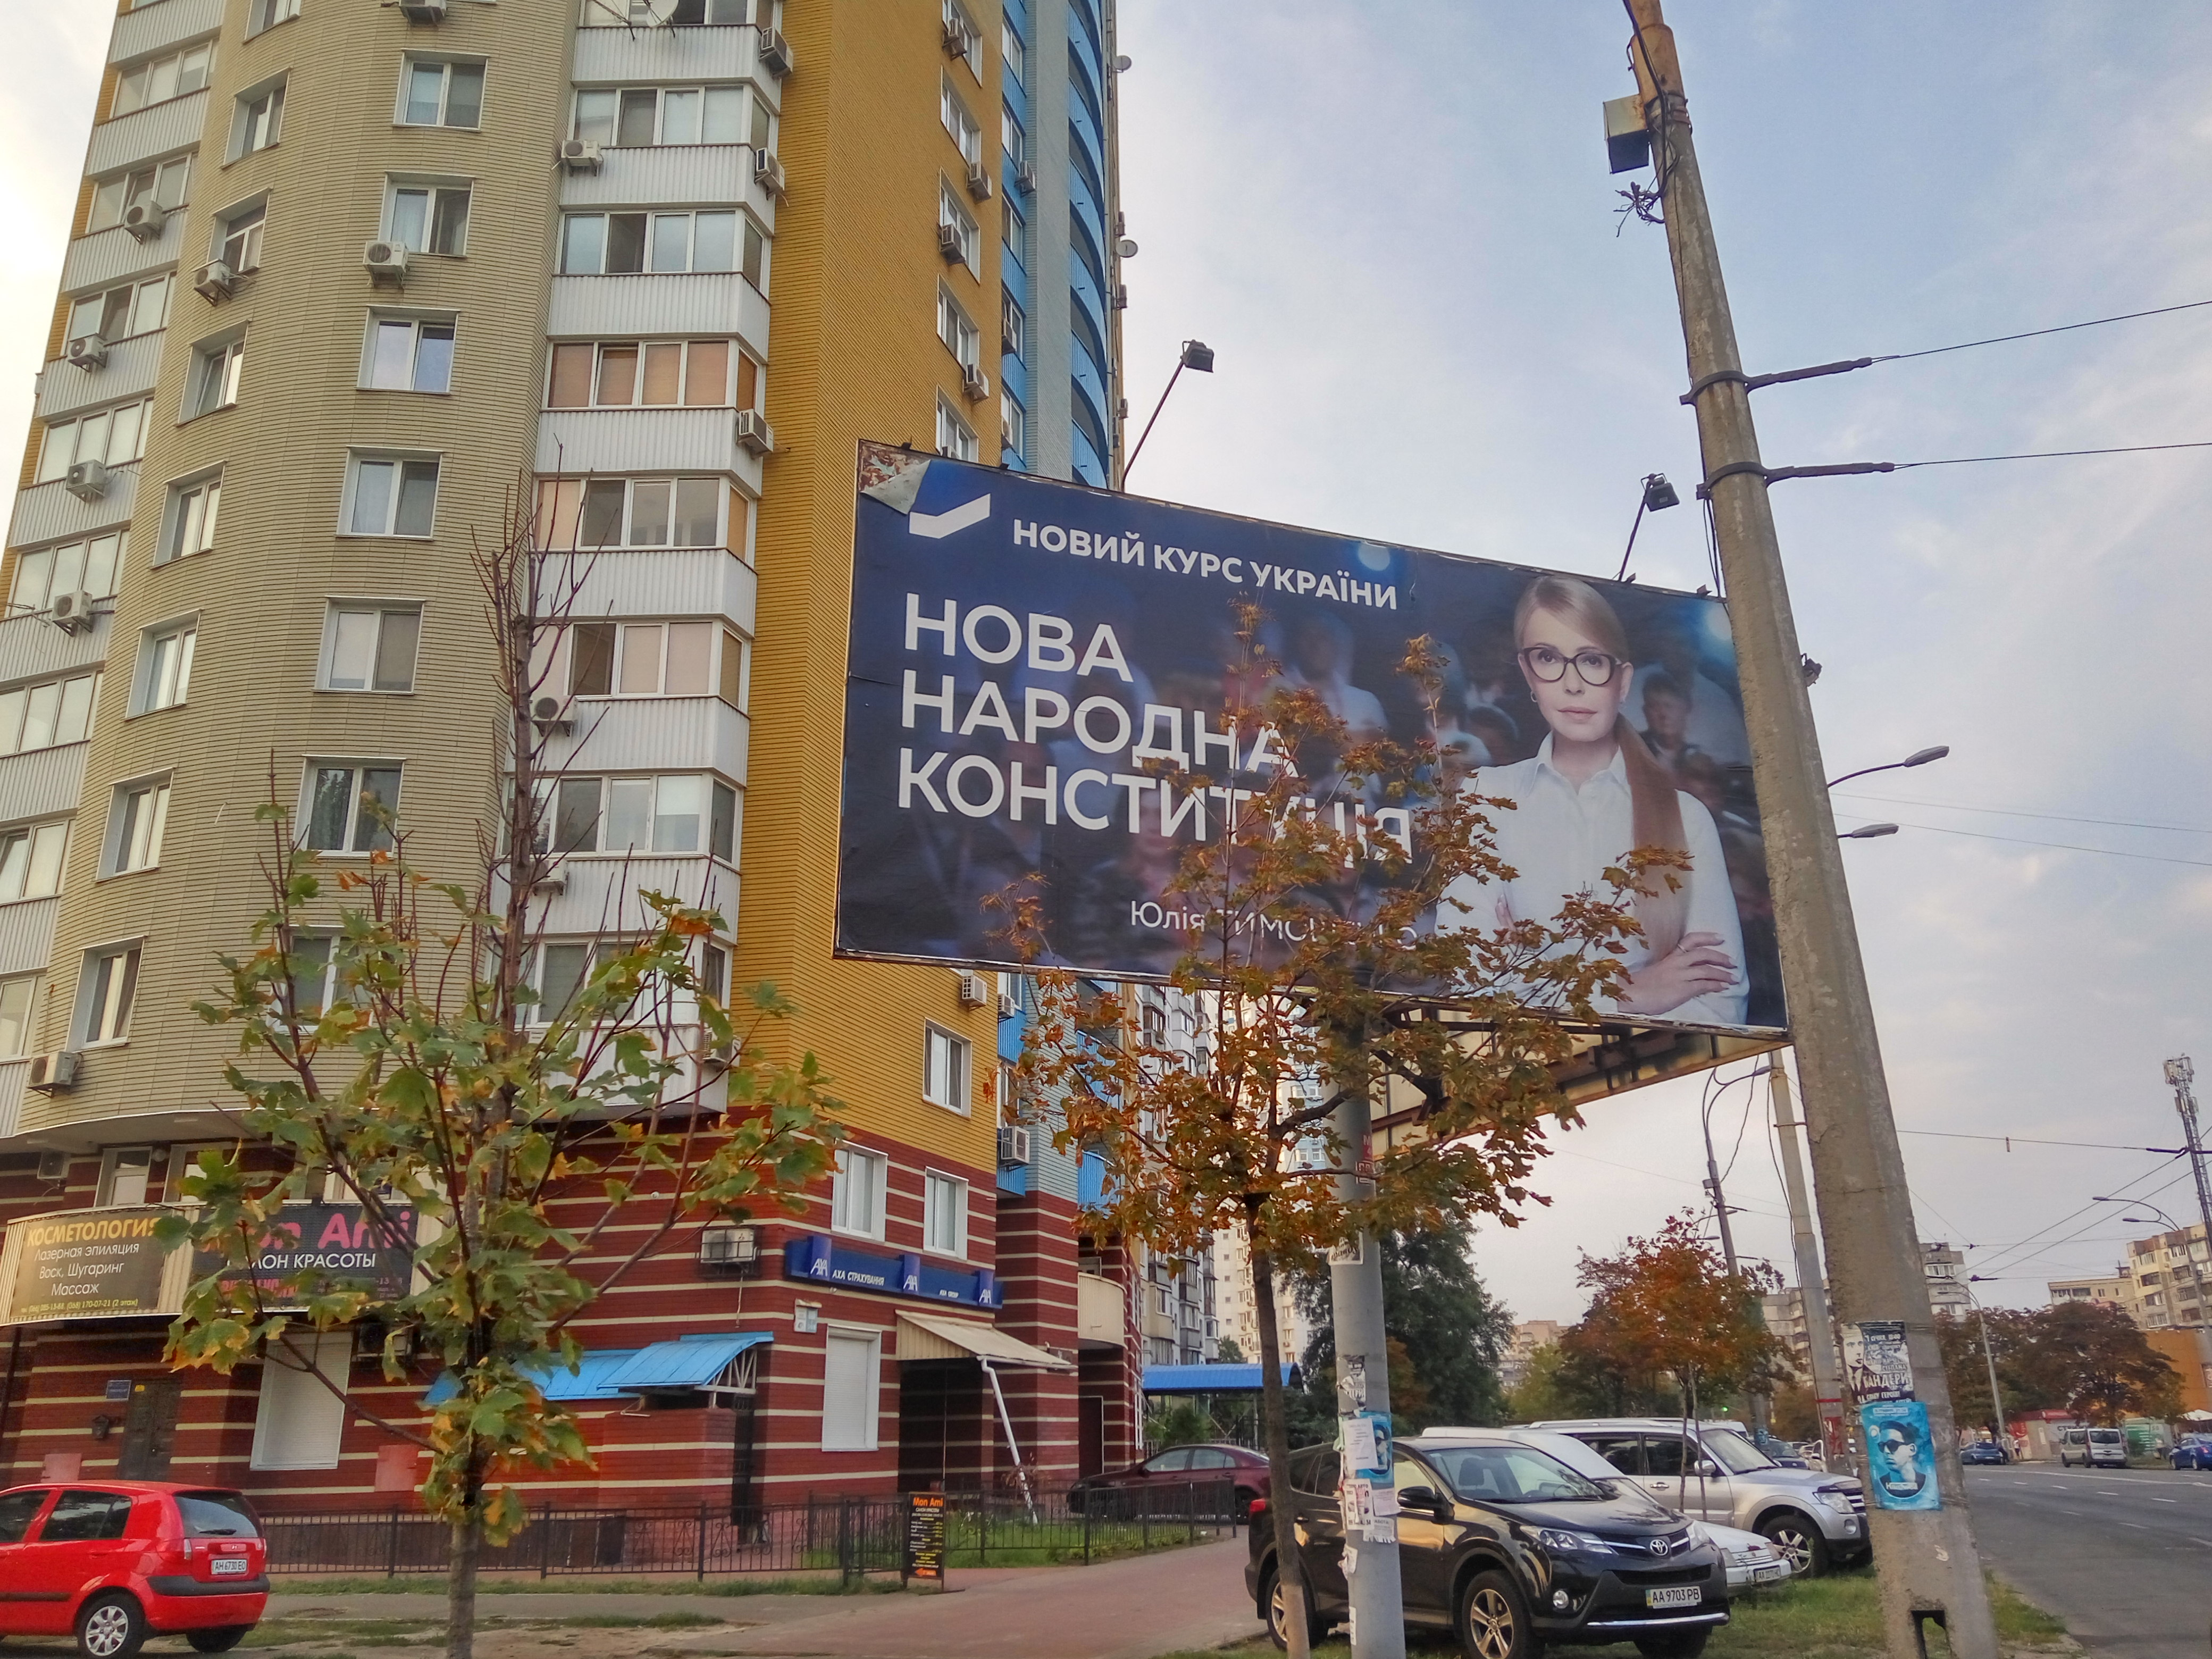 Реклама Тимошенко висит на каждом шагу, но субъективно ее меньше, чем у Порошенко (фото - LIGA.net)